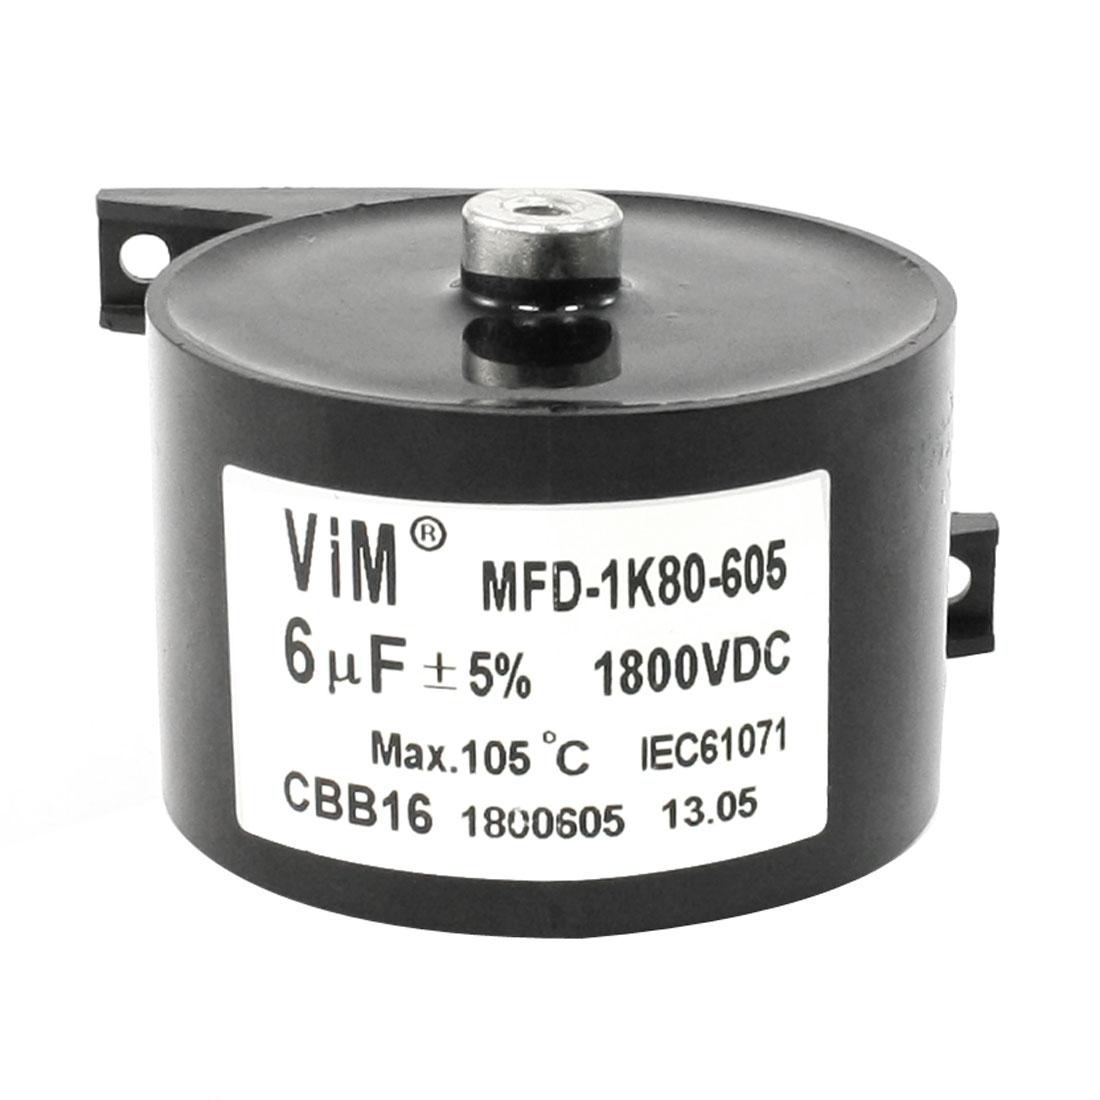 Black Plastic Housing CBB16 6uF 1800VDC Motor Running Capacitor